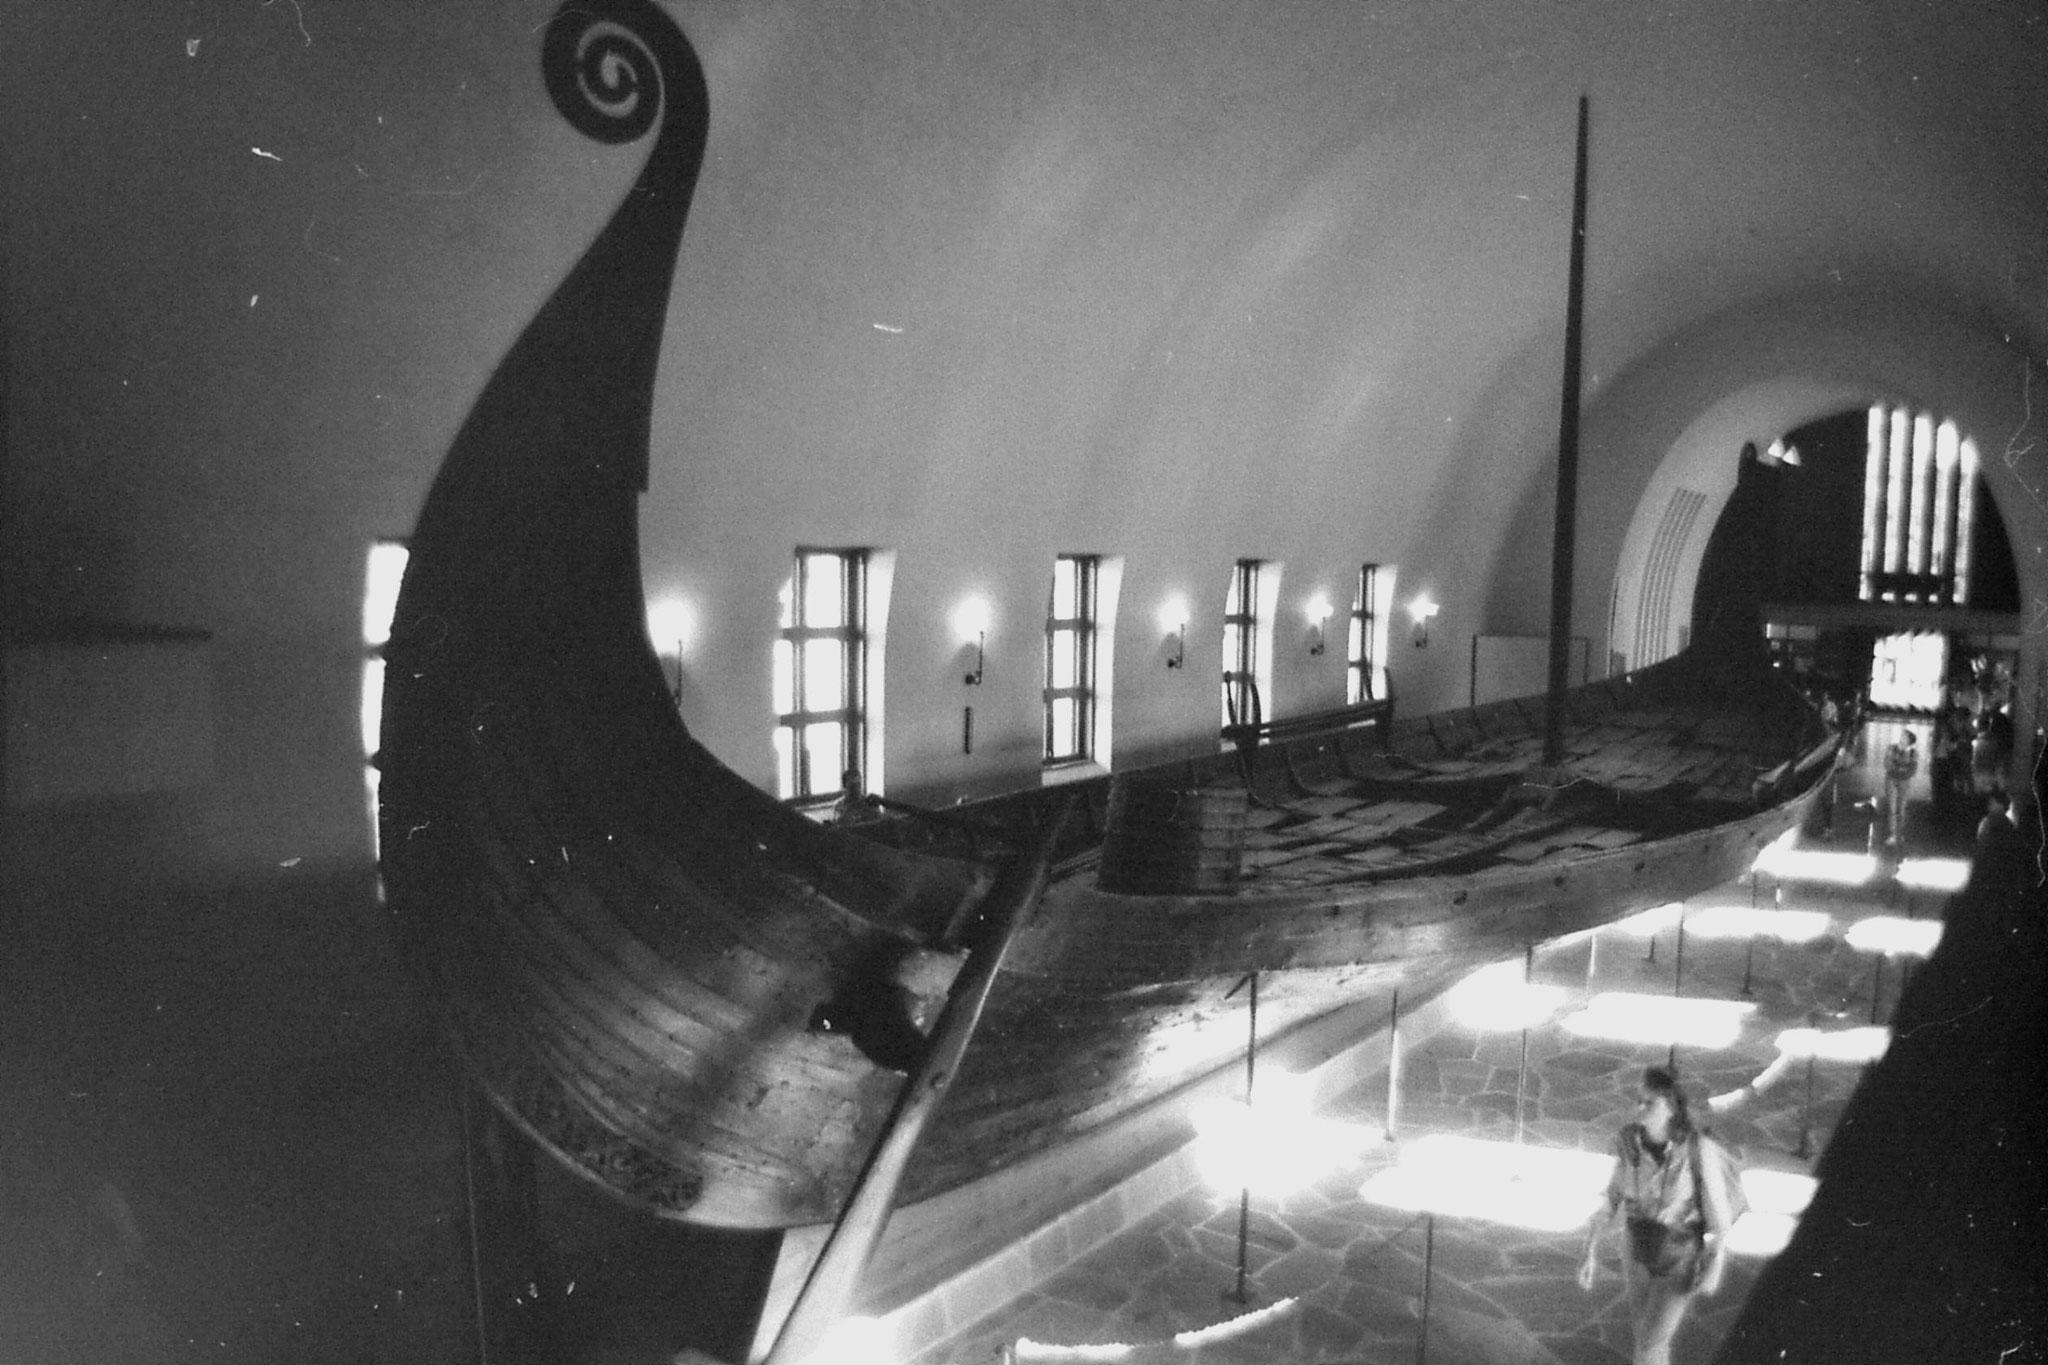 16/9/1988: 11: Viking museum Oslo